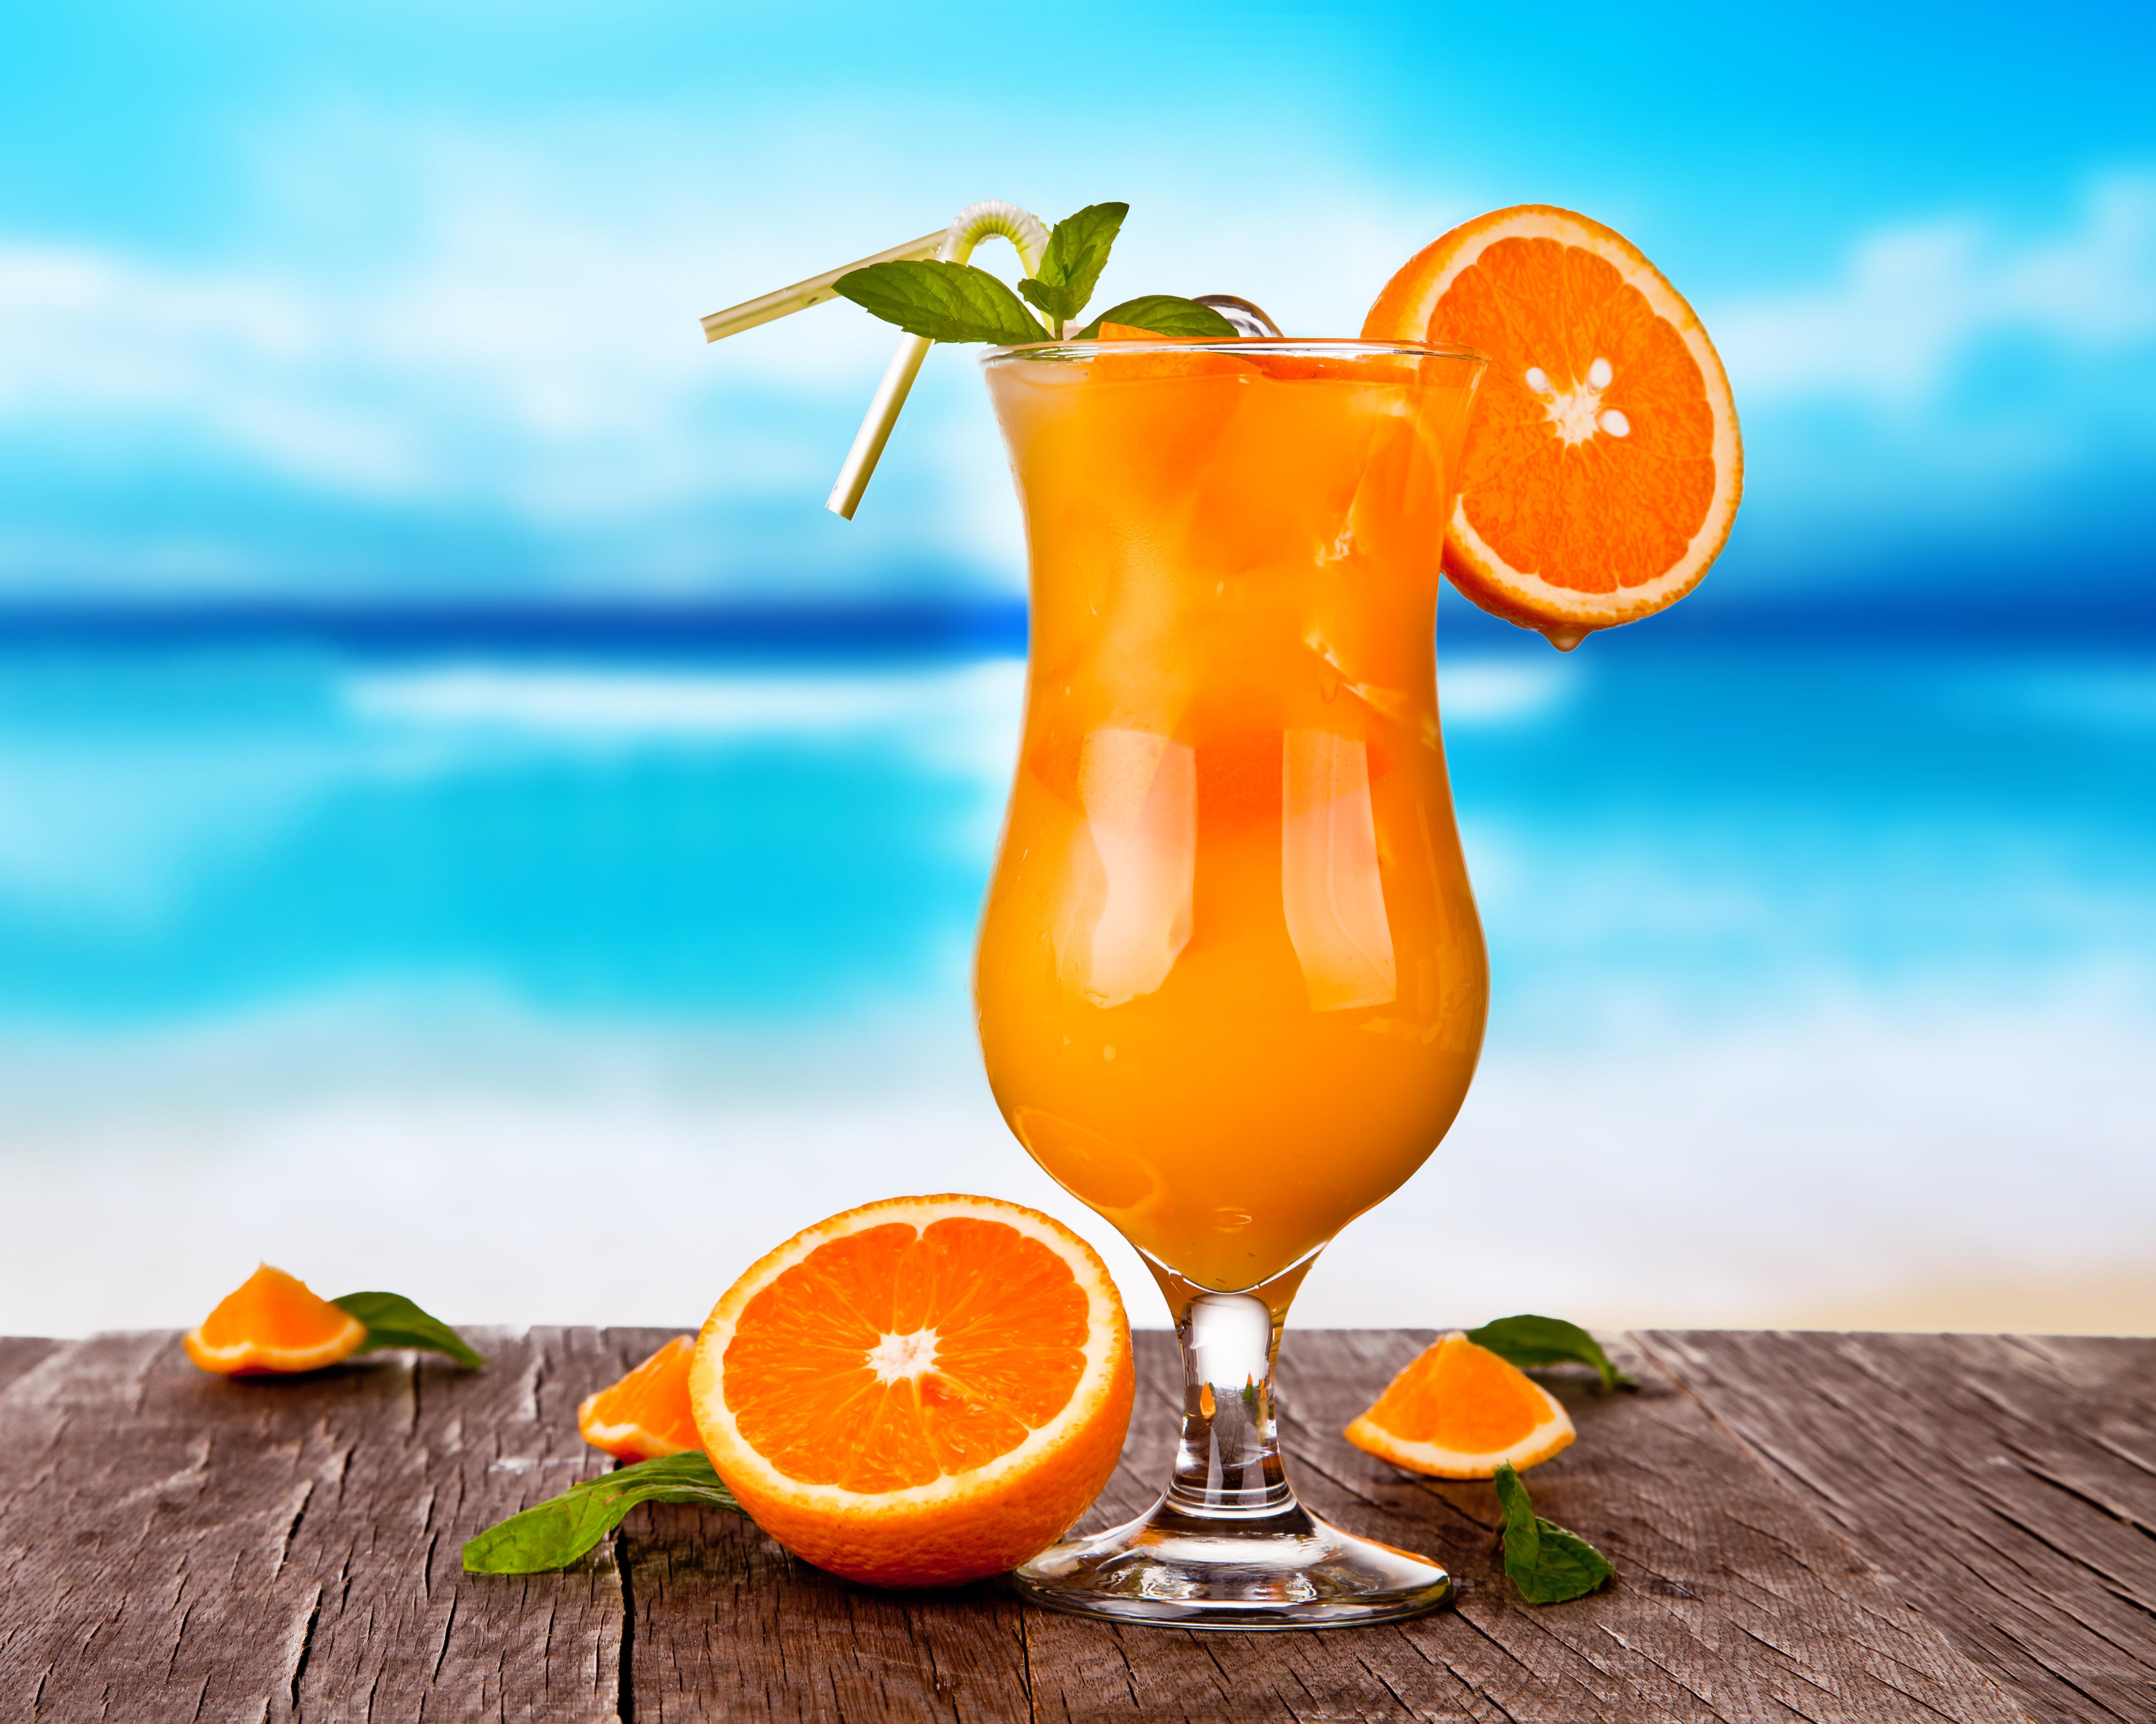 еда напитки лайм лимон апельсин клубника вишня коктейль food drinks lime lemon orange strawberry cherry cocktail  № 2154635 бесплатно